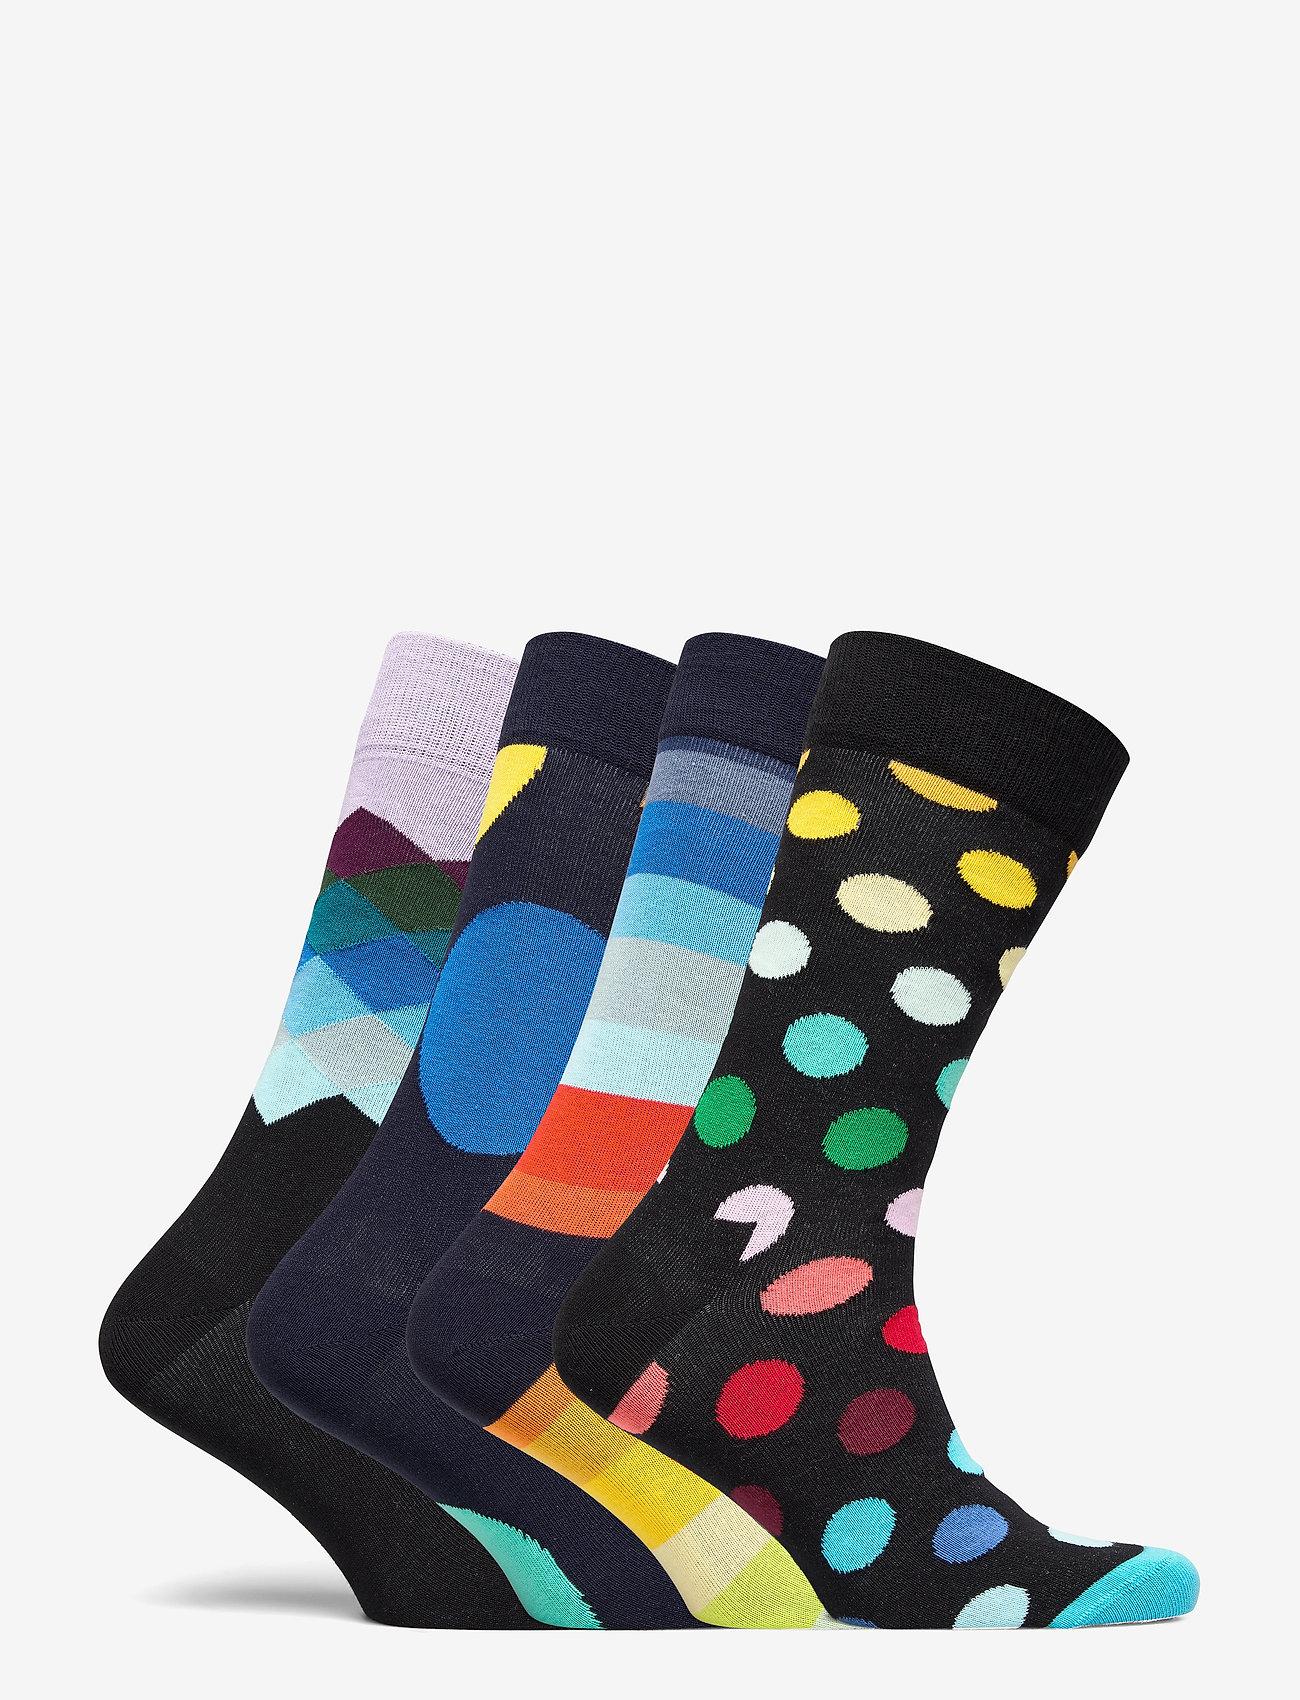 Särskild rabatt4-pack Classic Multi-color Socks Gift Set Multi 261.75 Happy Socks tAQtX x4YLL